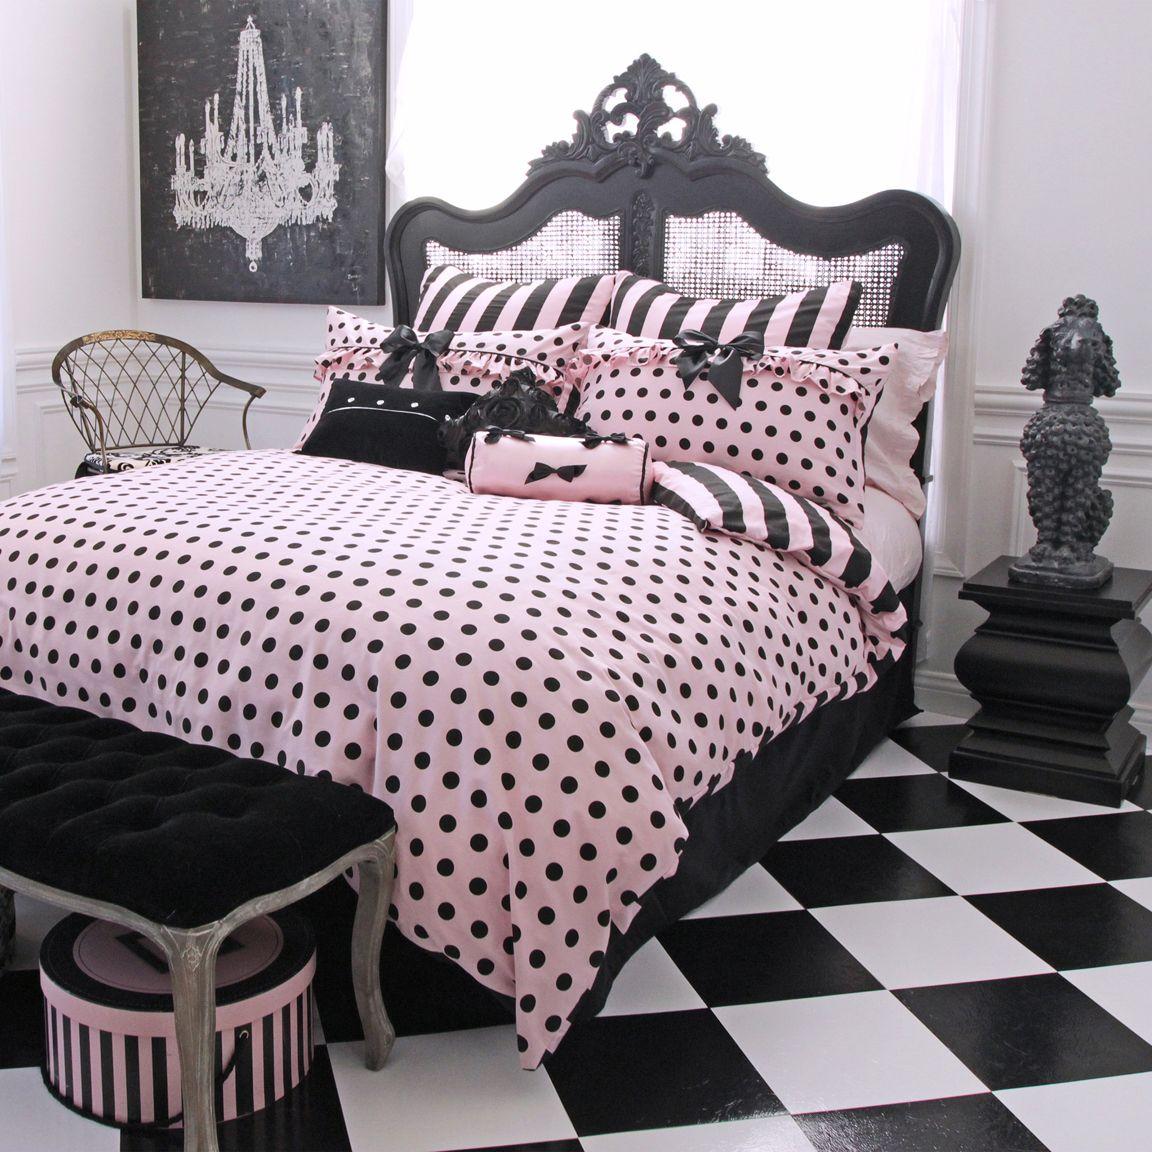 Bonny Polka Dot Bedroom Decorating Ideas